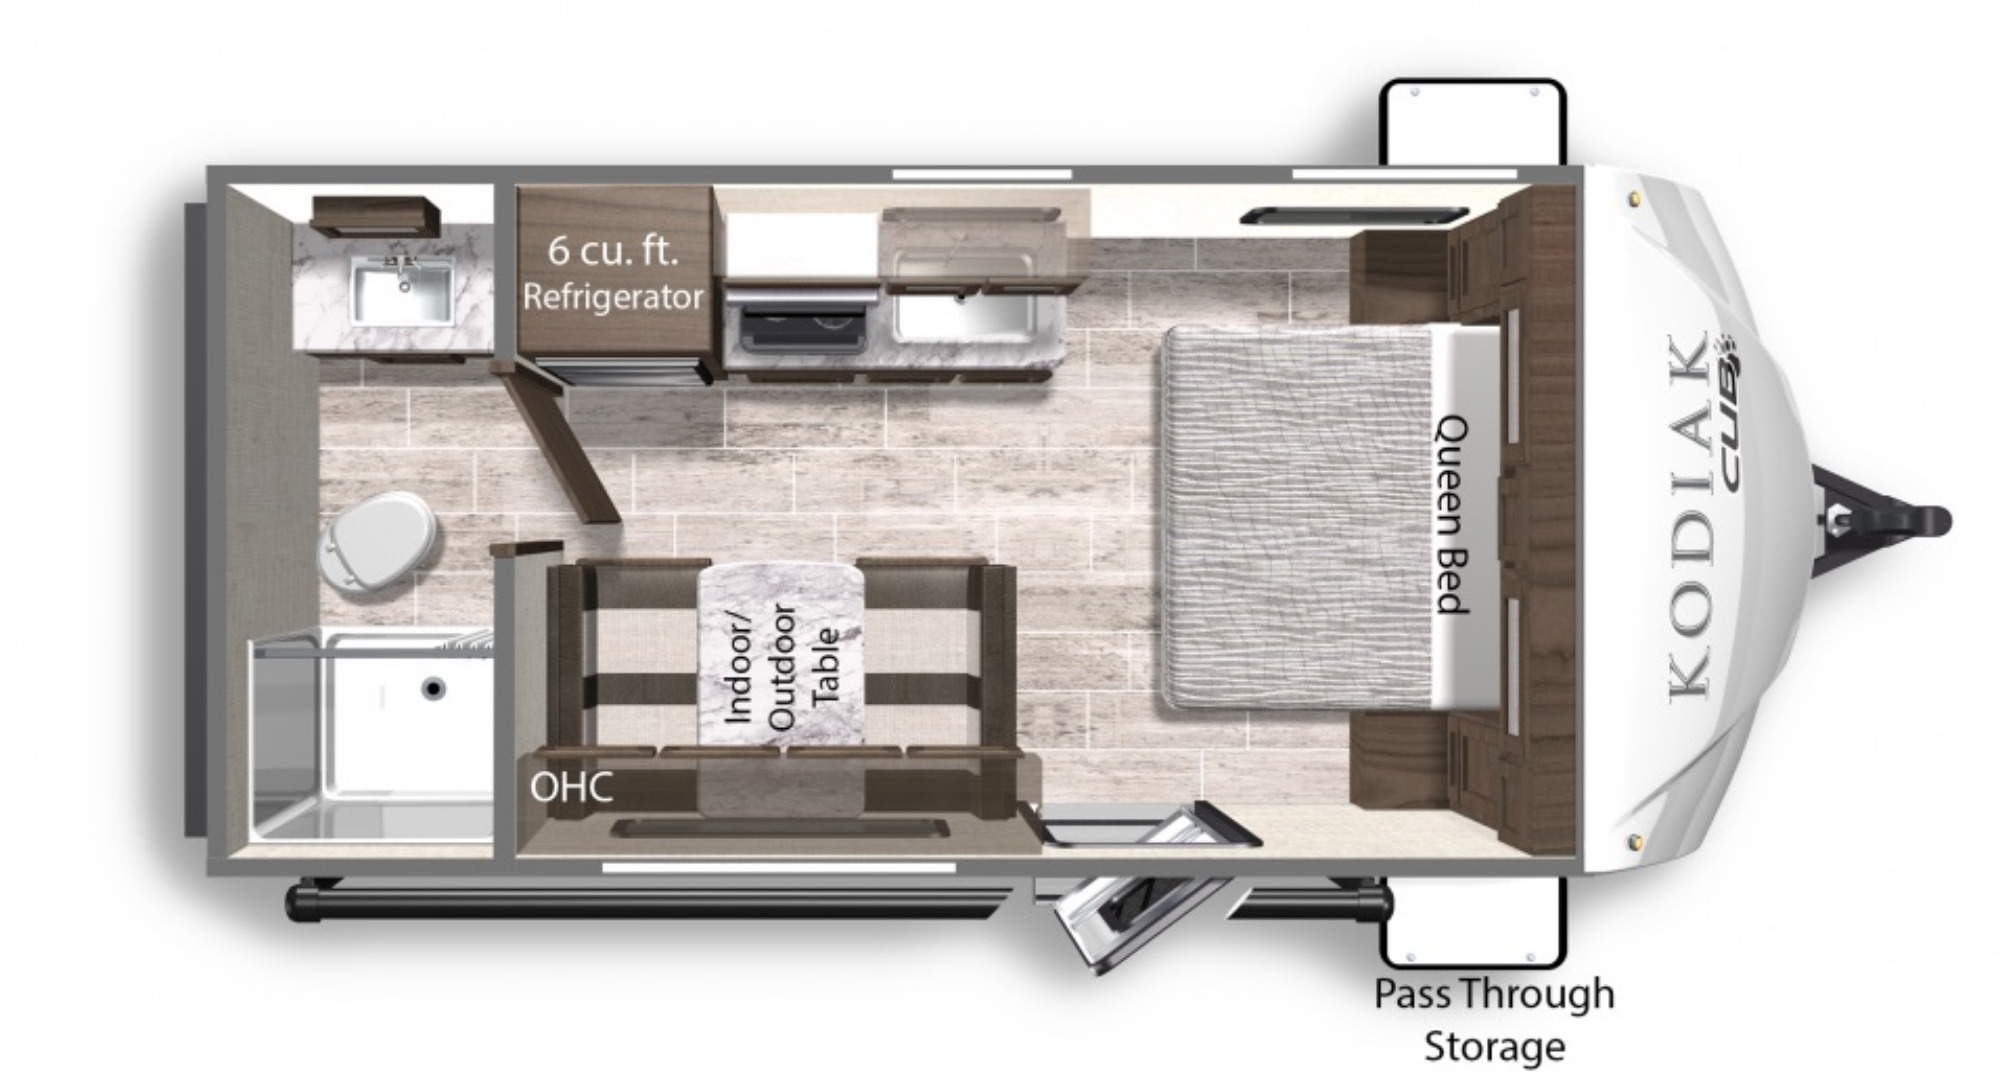 View Floor Plan for 2021 DUTCHMEN KODIAK CUB 177RB